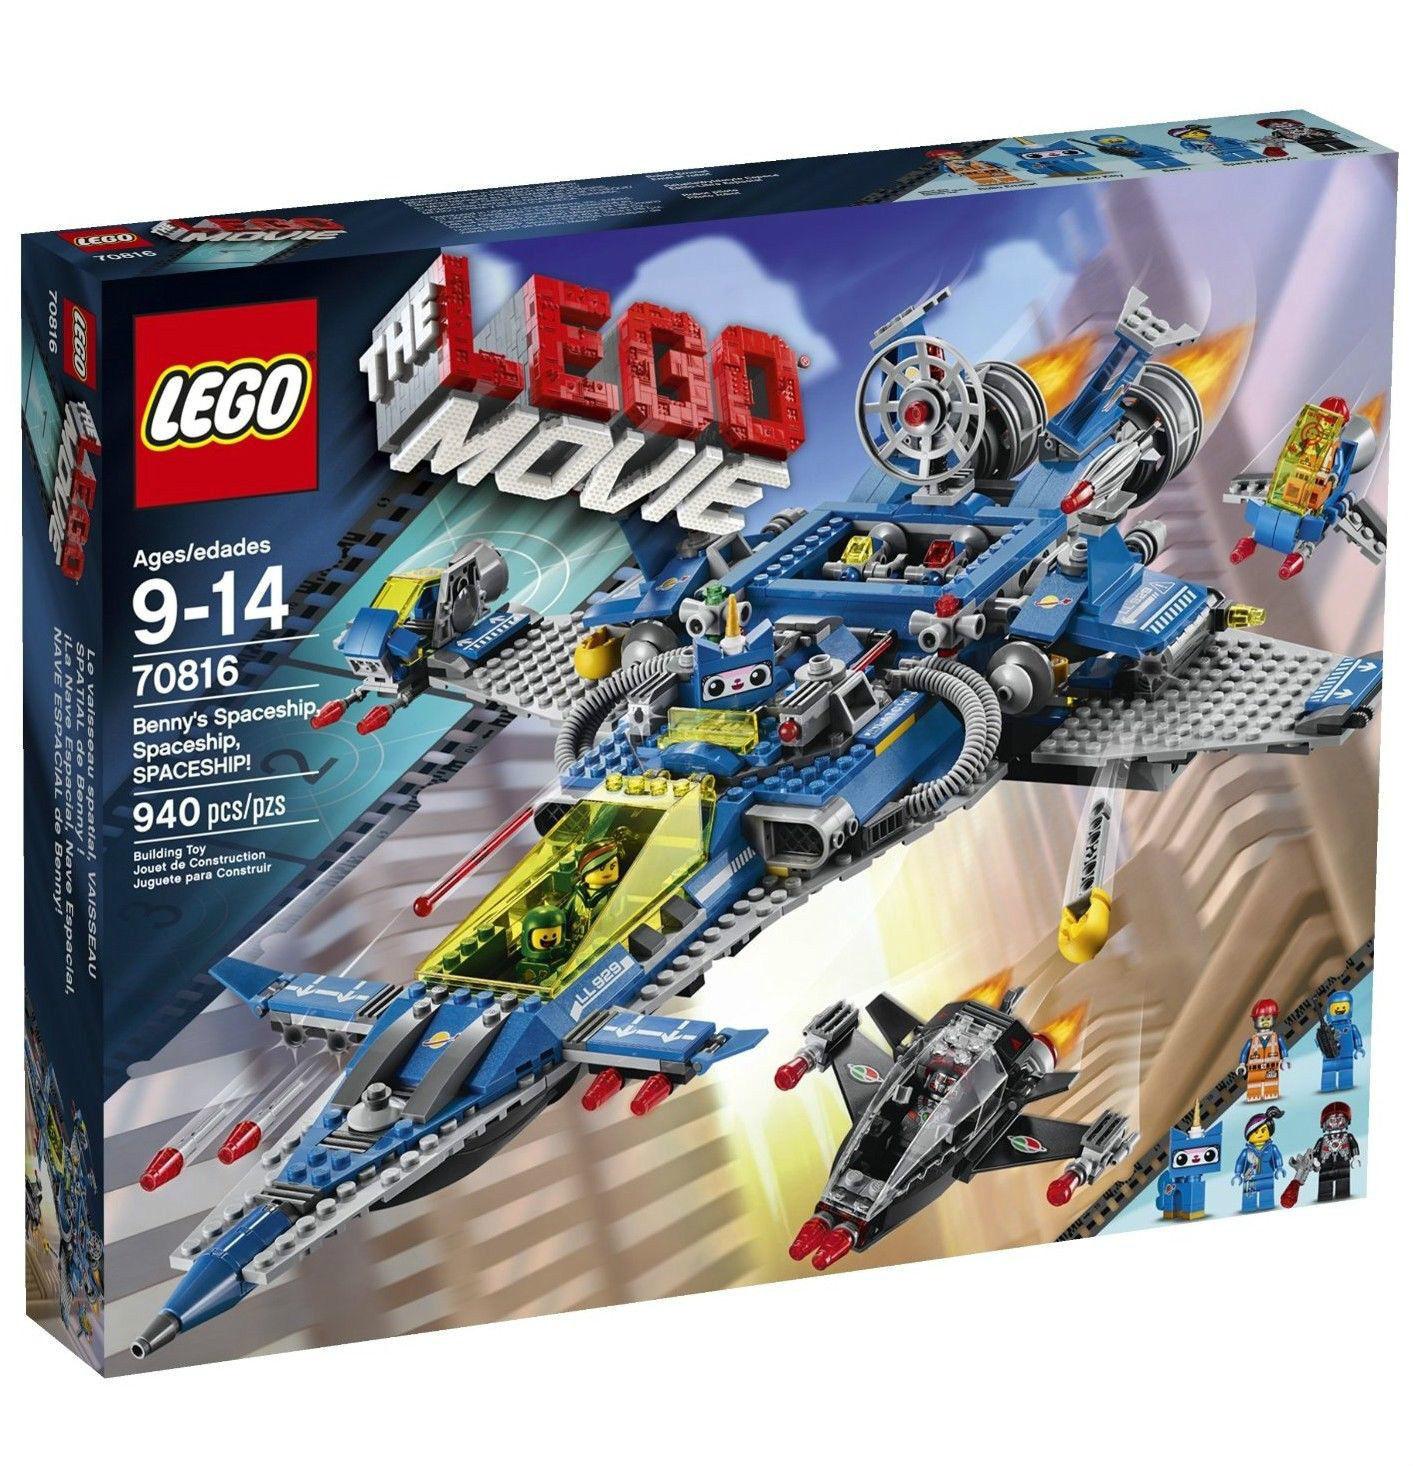 [ LEGO ] The Lego Movie - 70816 - Benny's Spaceship, Spaceship, SPACESHIP! - NEW